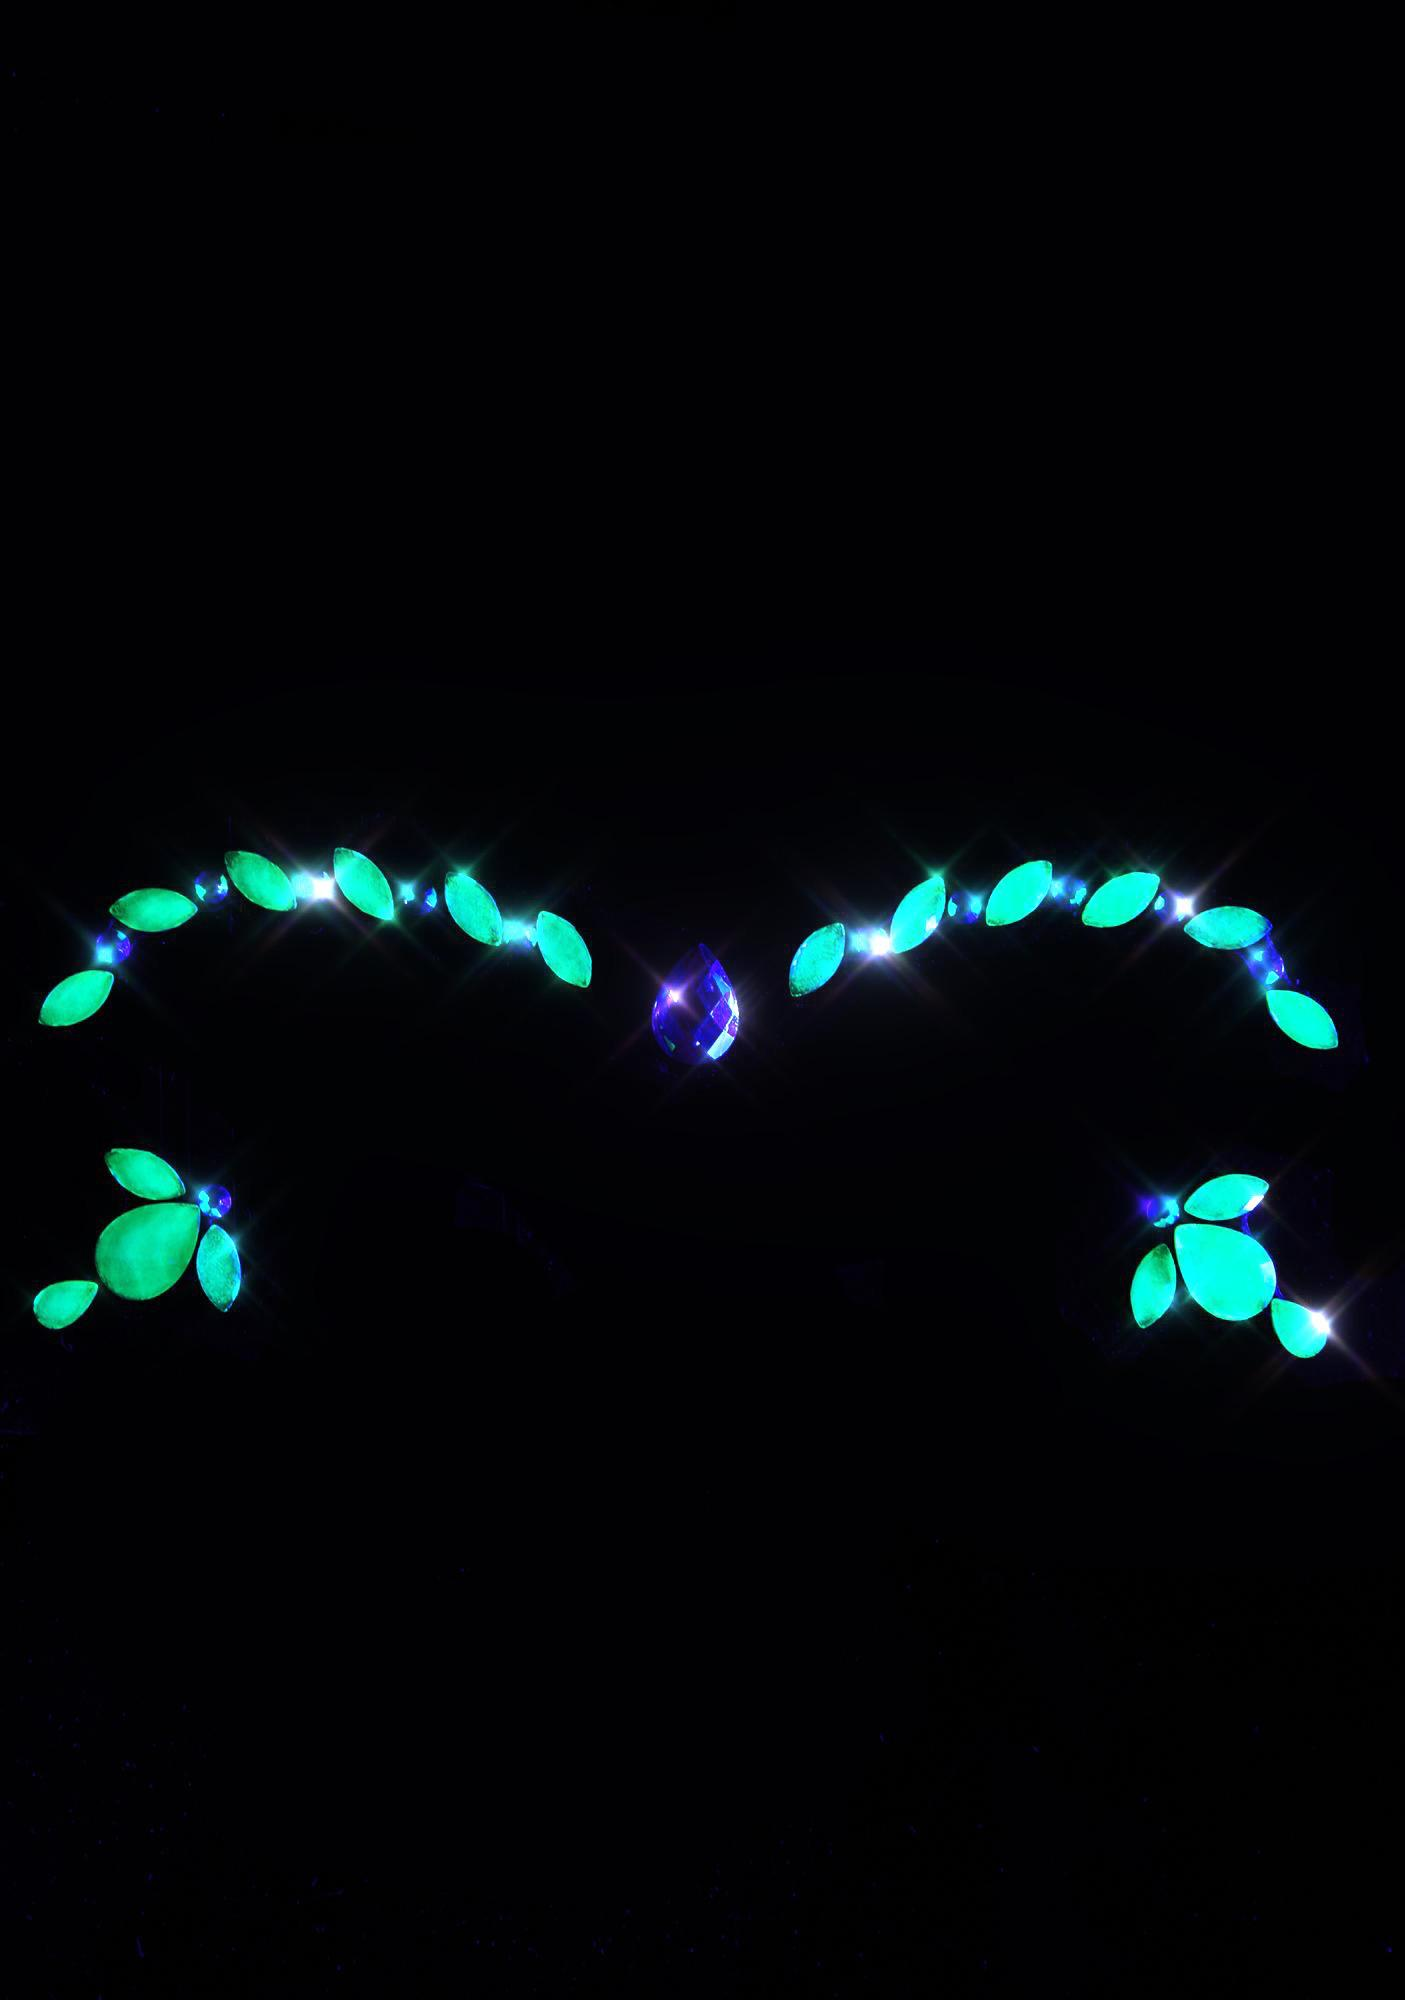 Lunautics Midori UV Cosmic Crystals